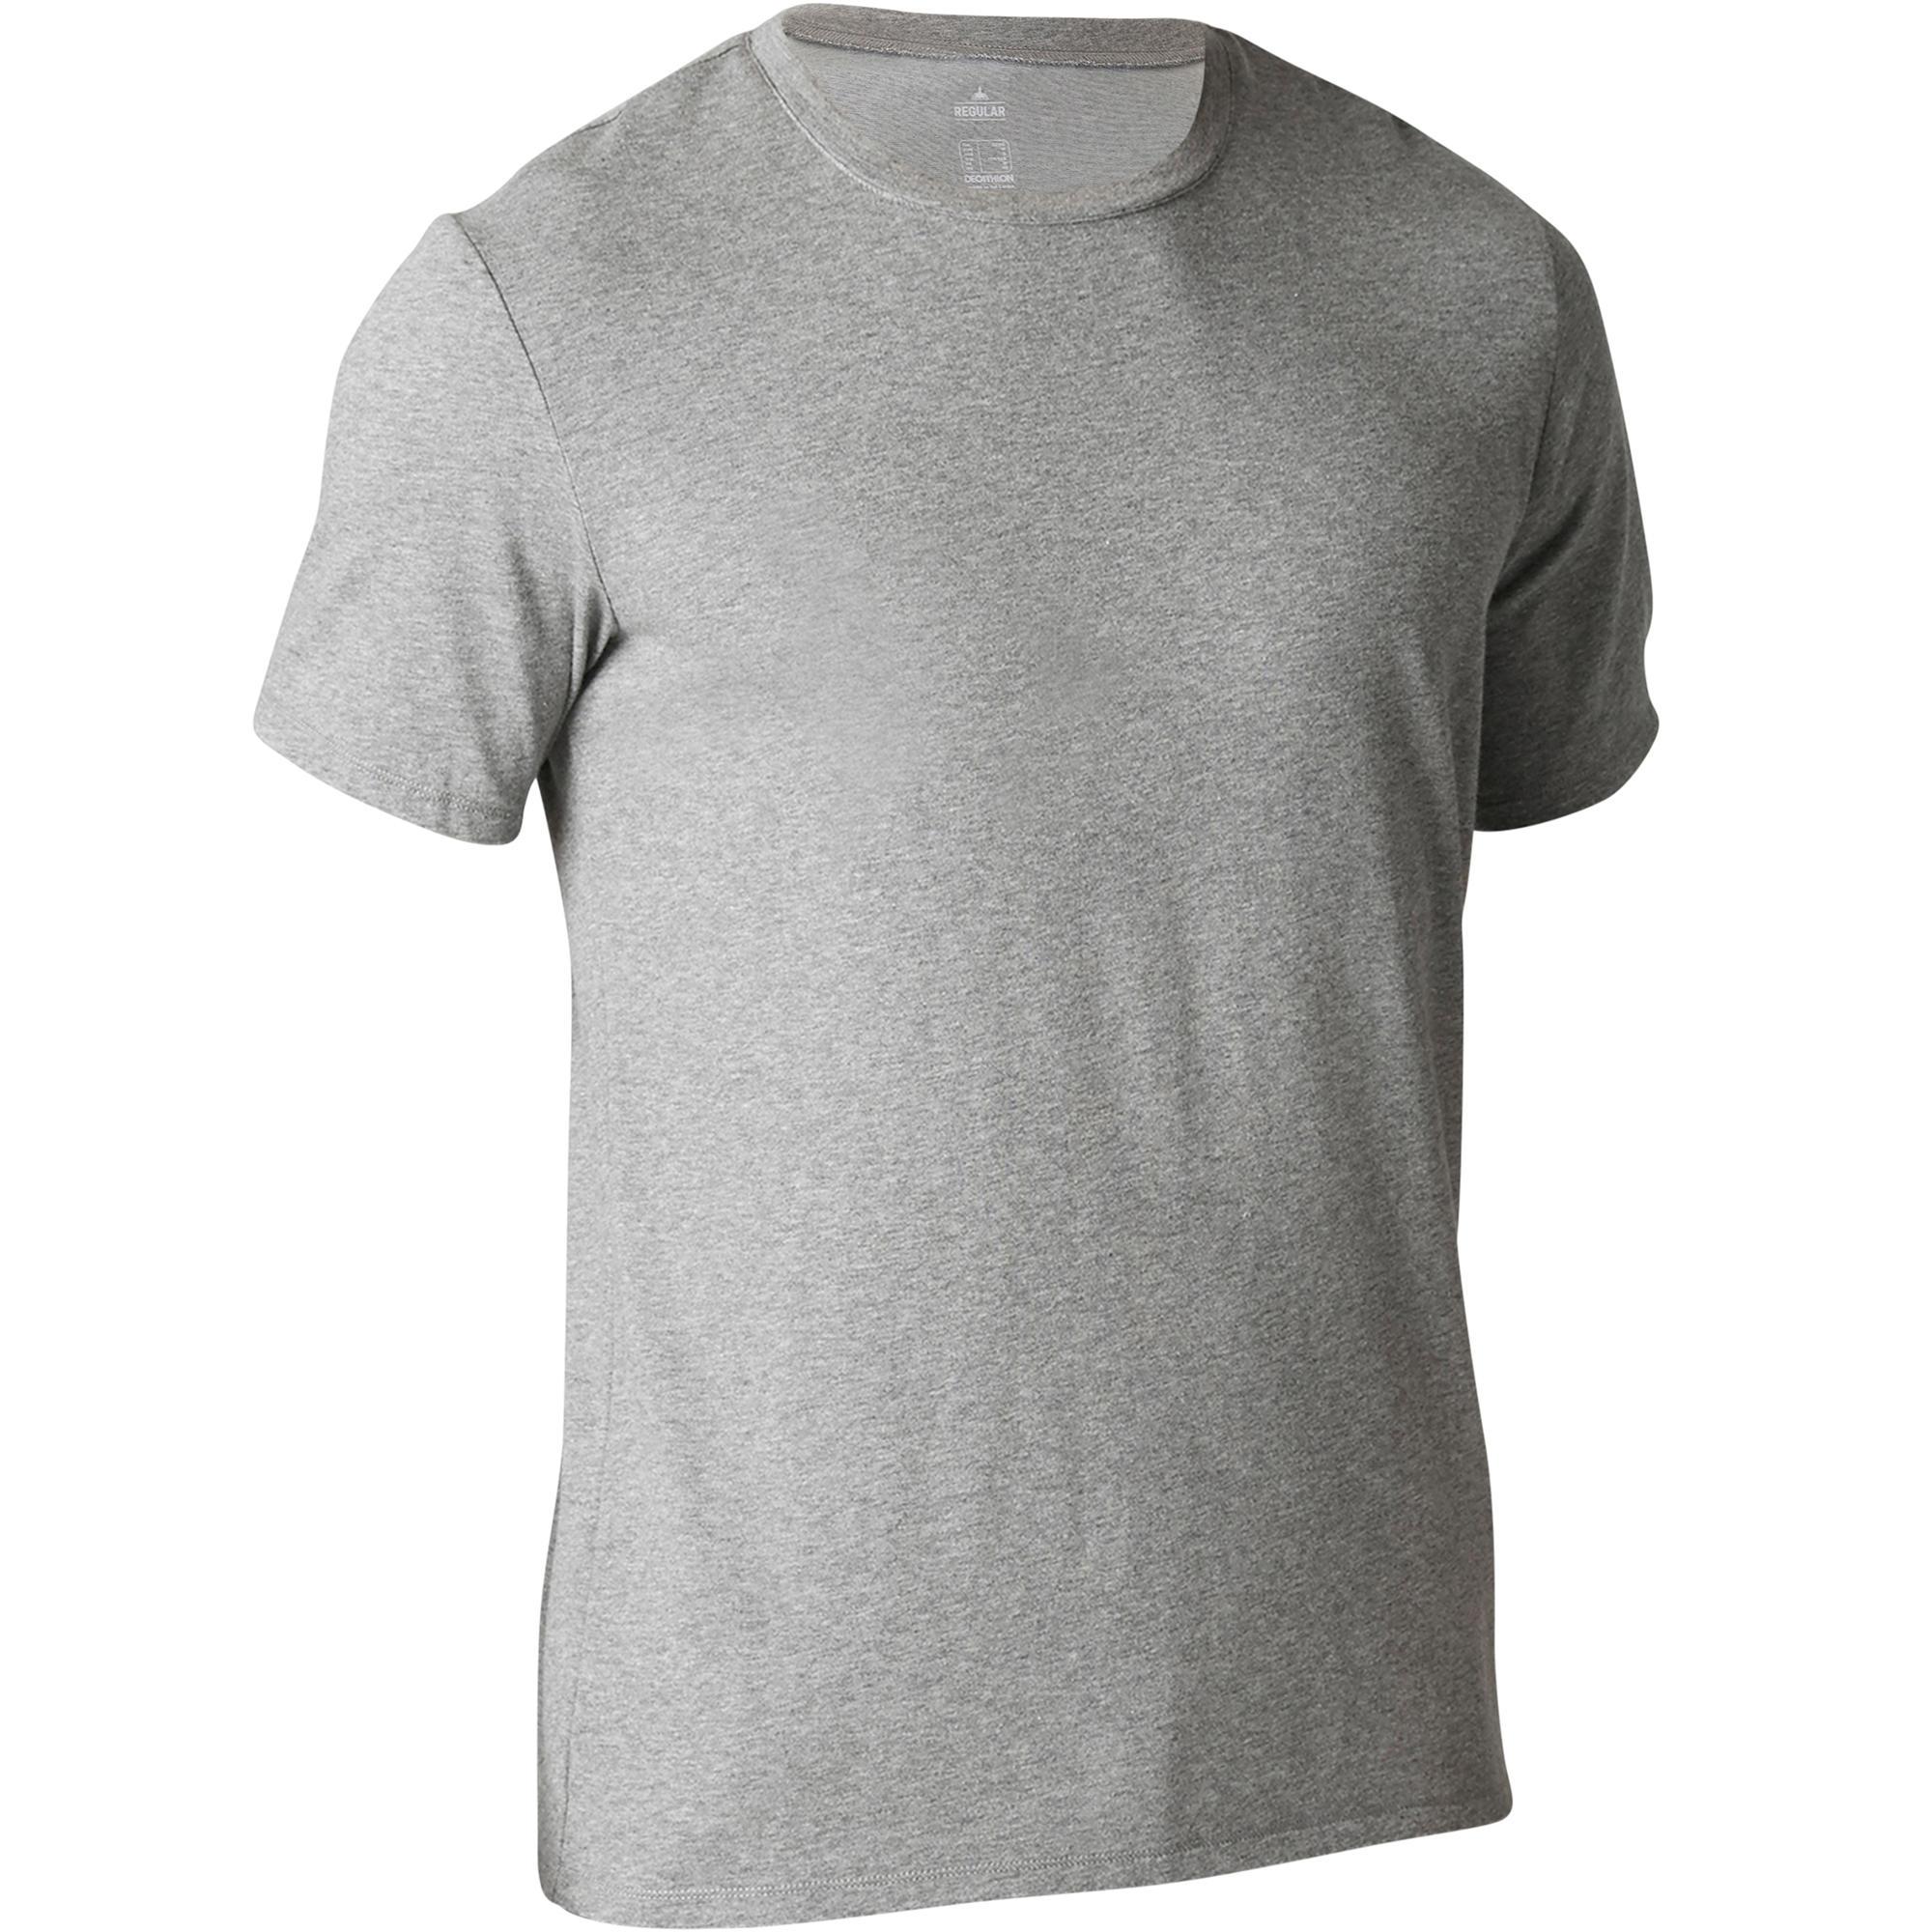 Domyos T-shirt 500 regular fit pilates en lichte gym heren